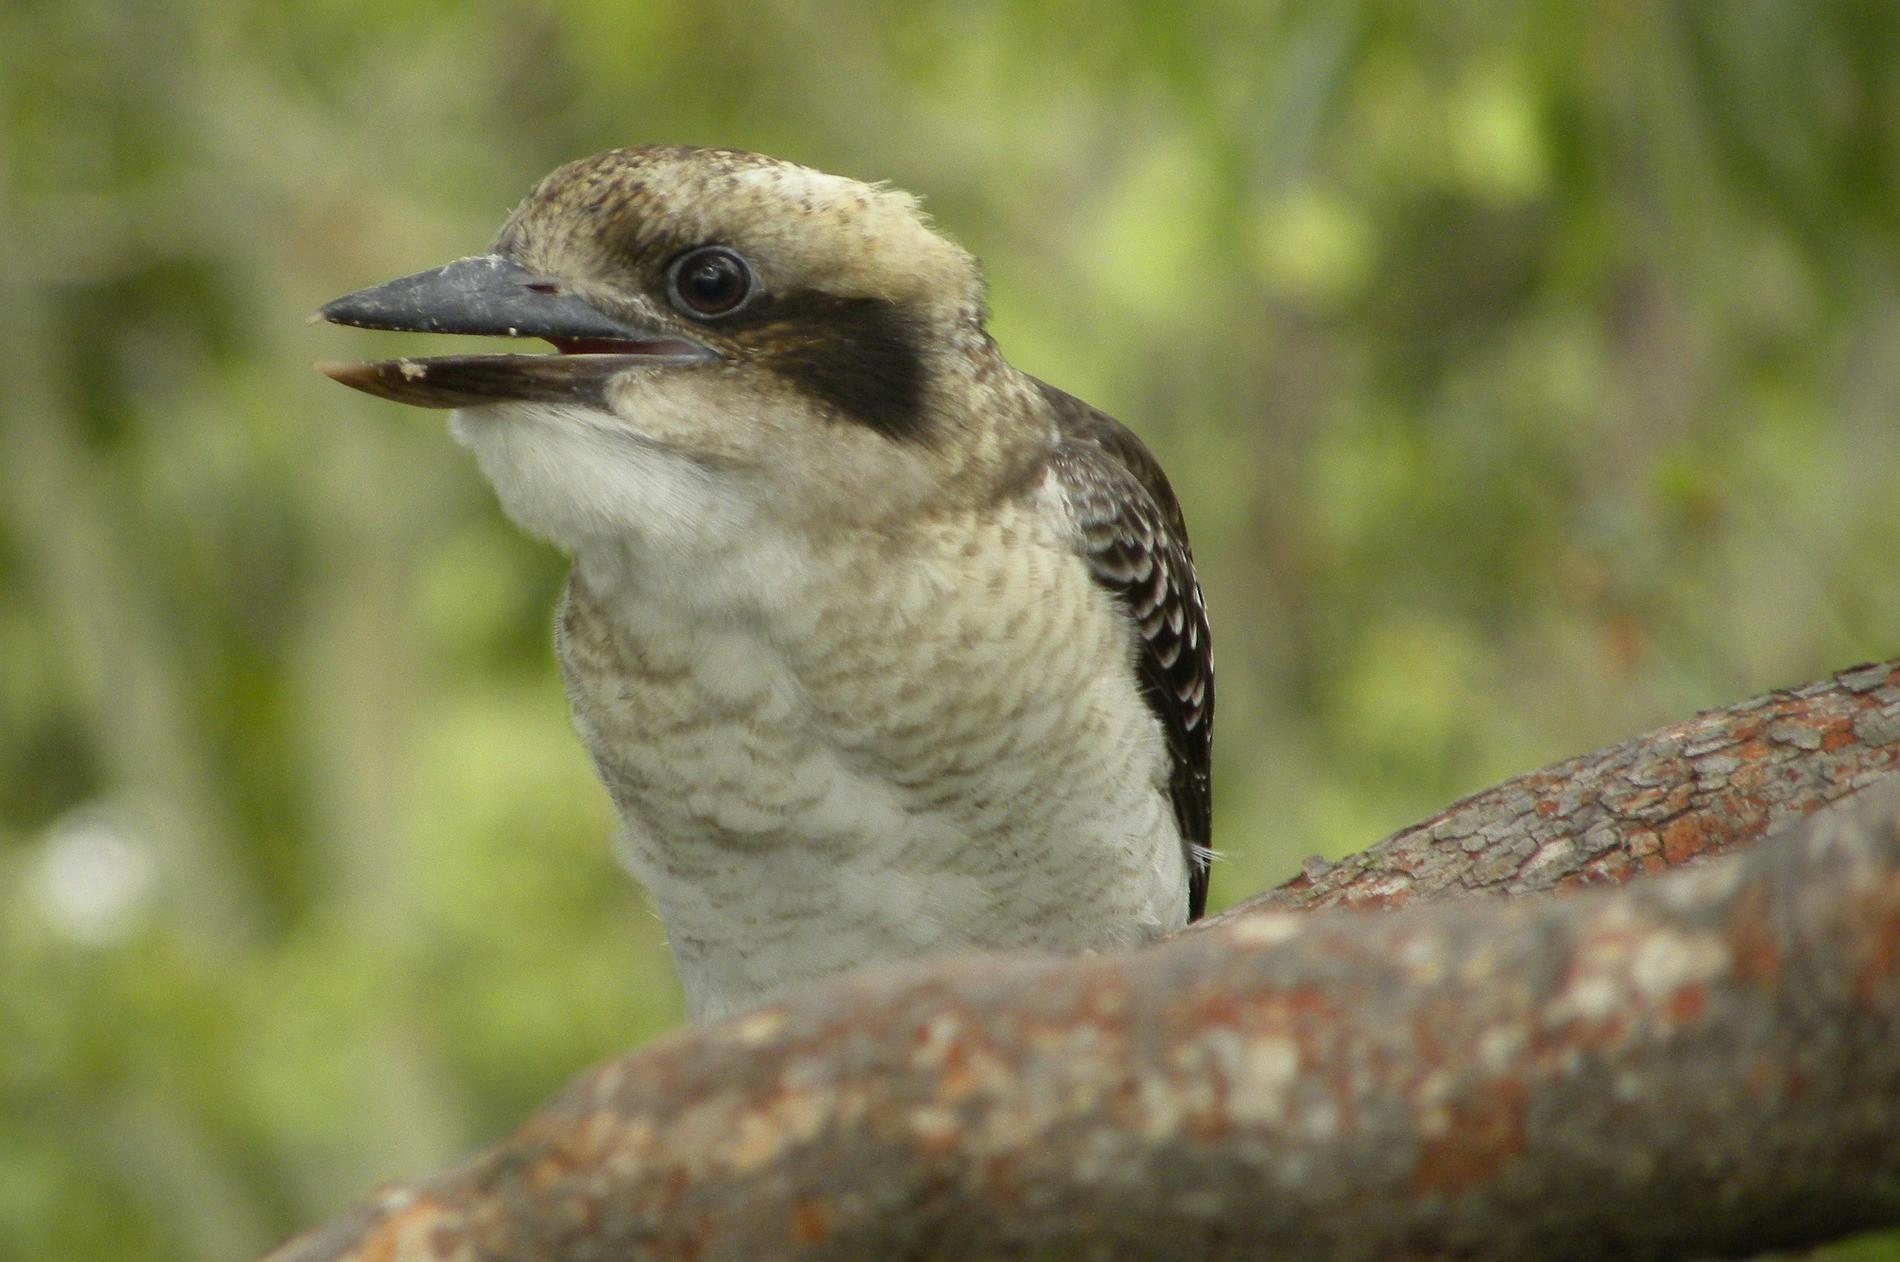 Australiens Tierwelt: Der Kookaburra